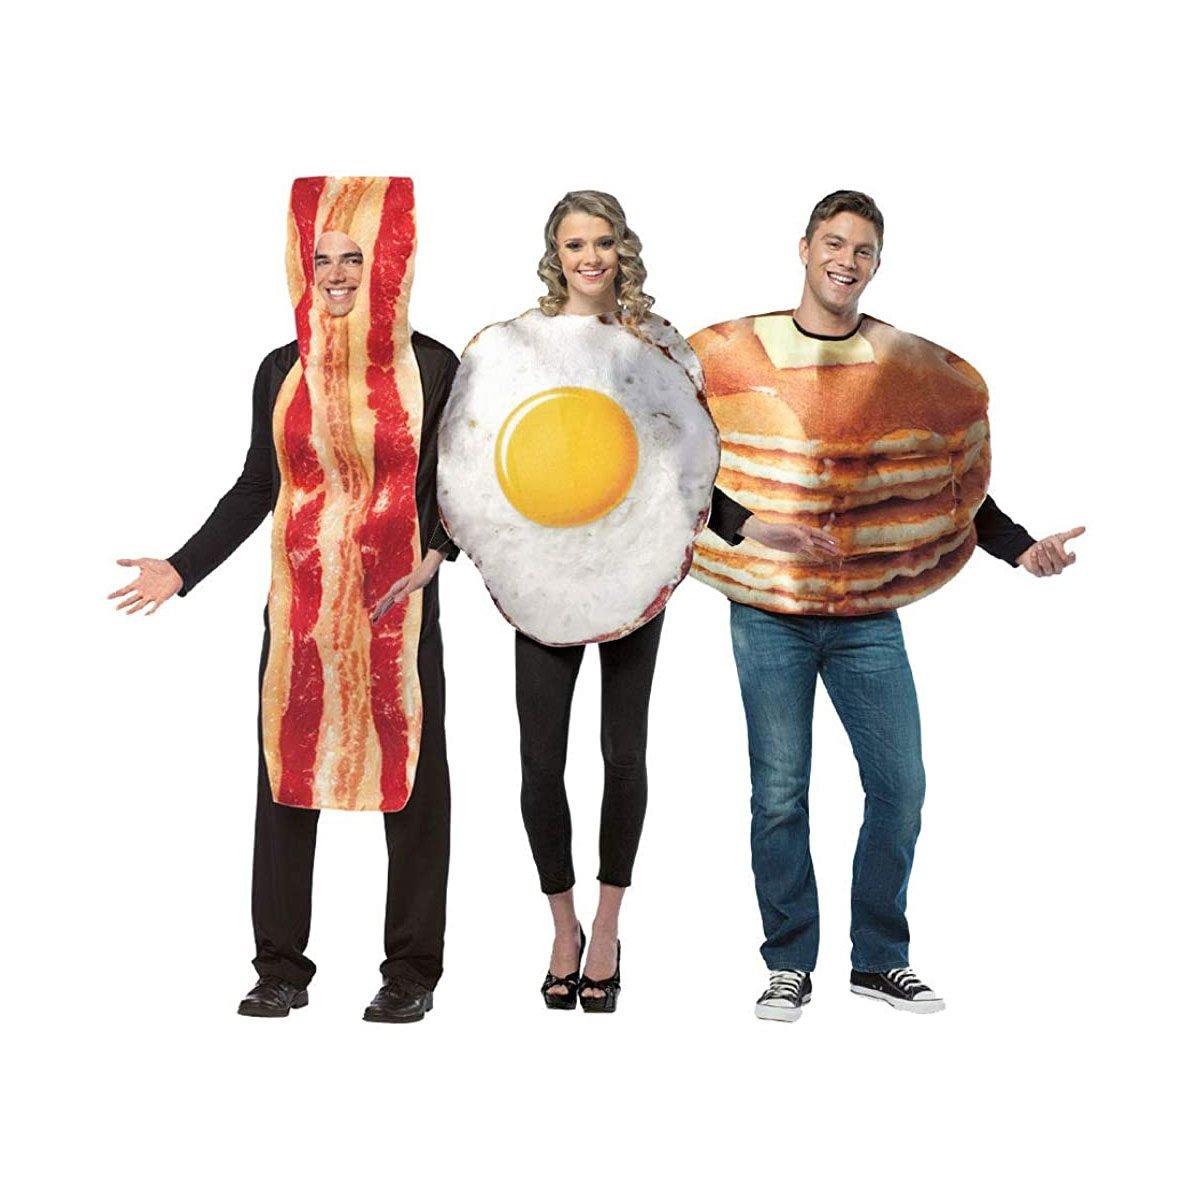 Breakfast costume